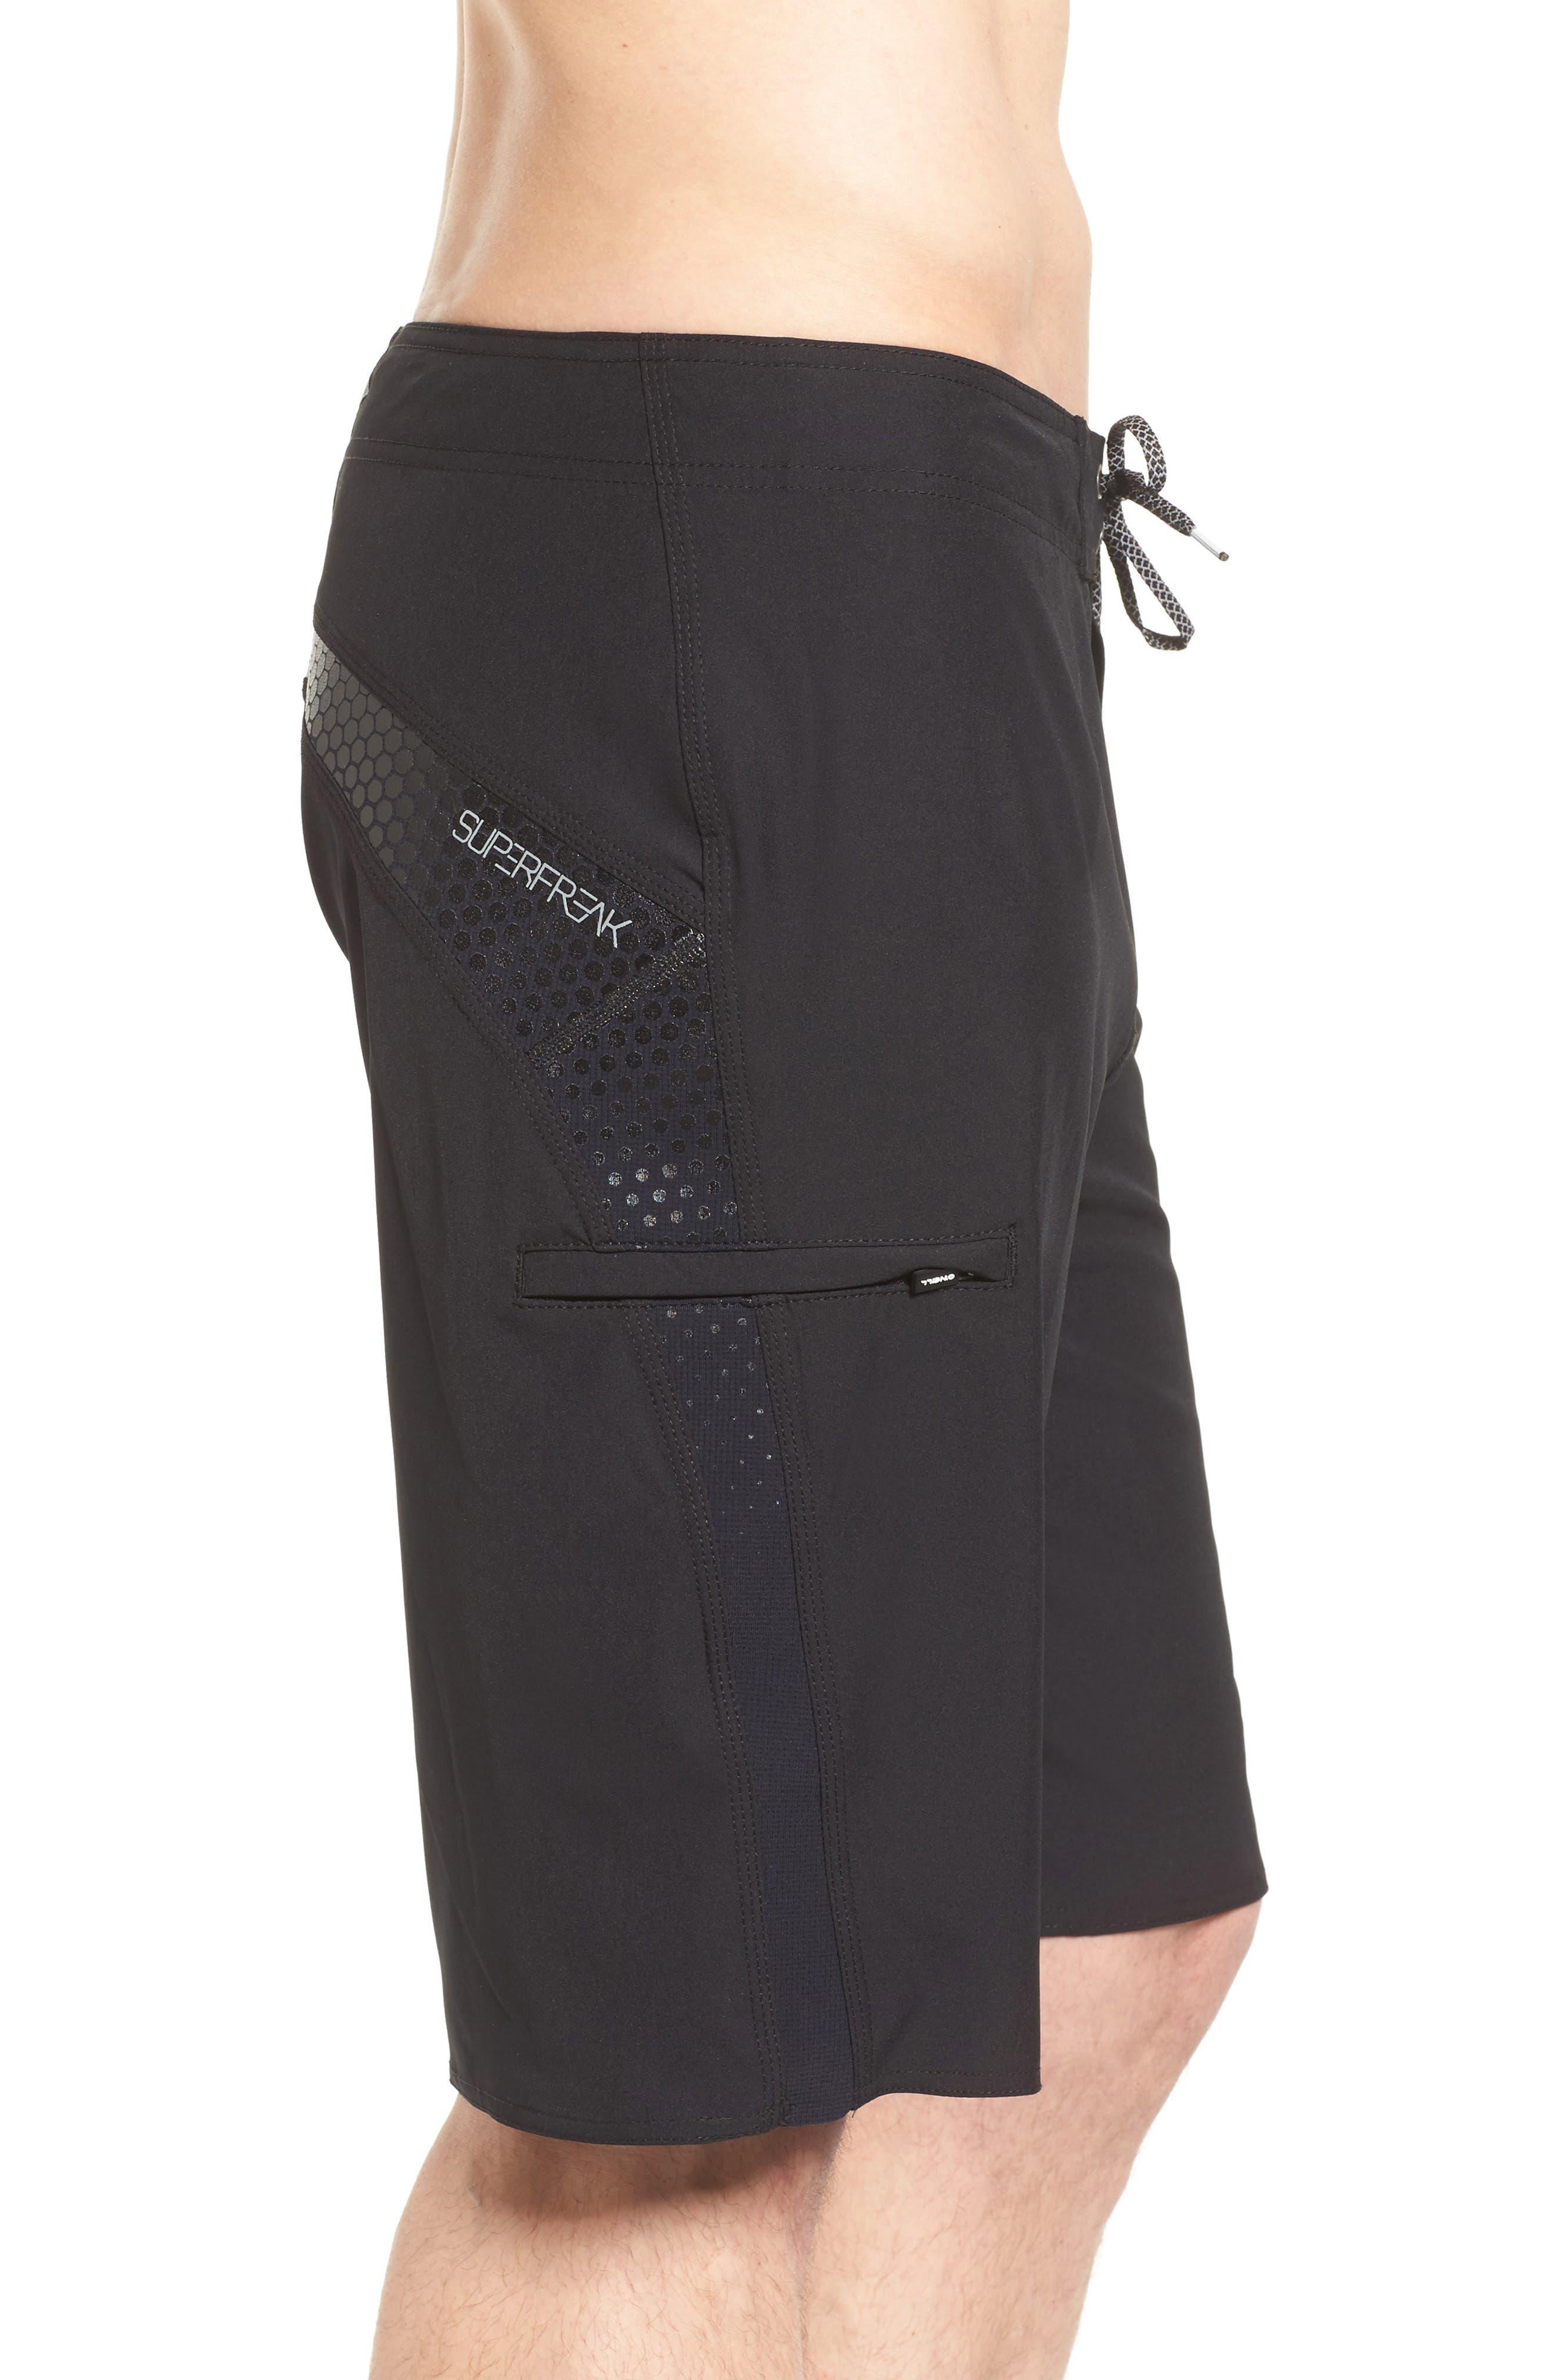 Superfreak Board Shorts,                             Alternate thumbnail 3, color,                             Black